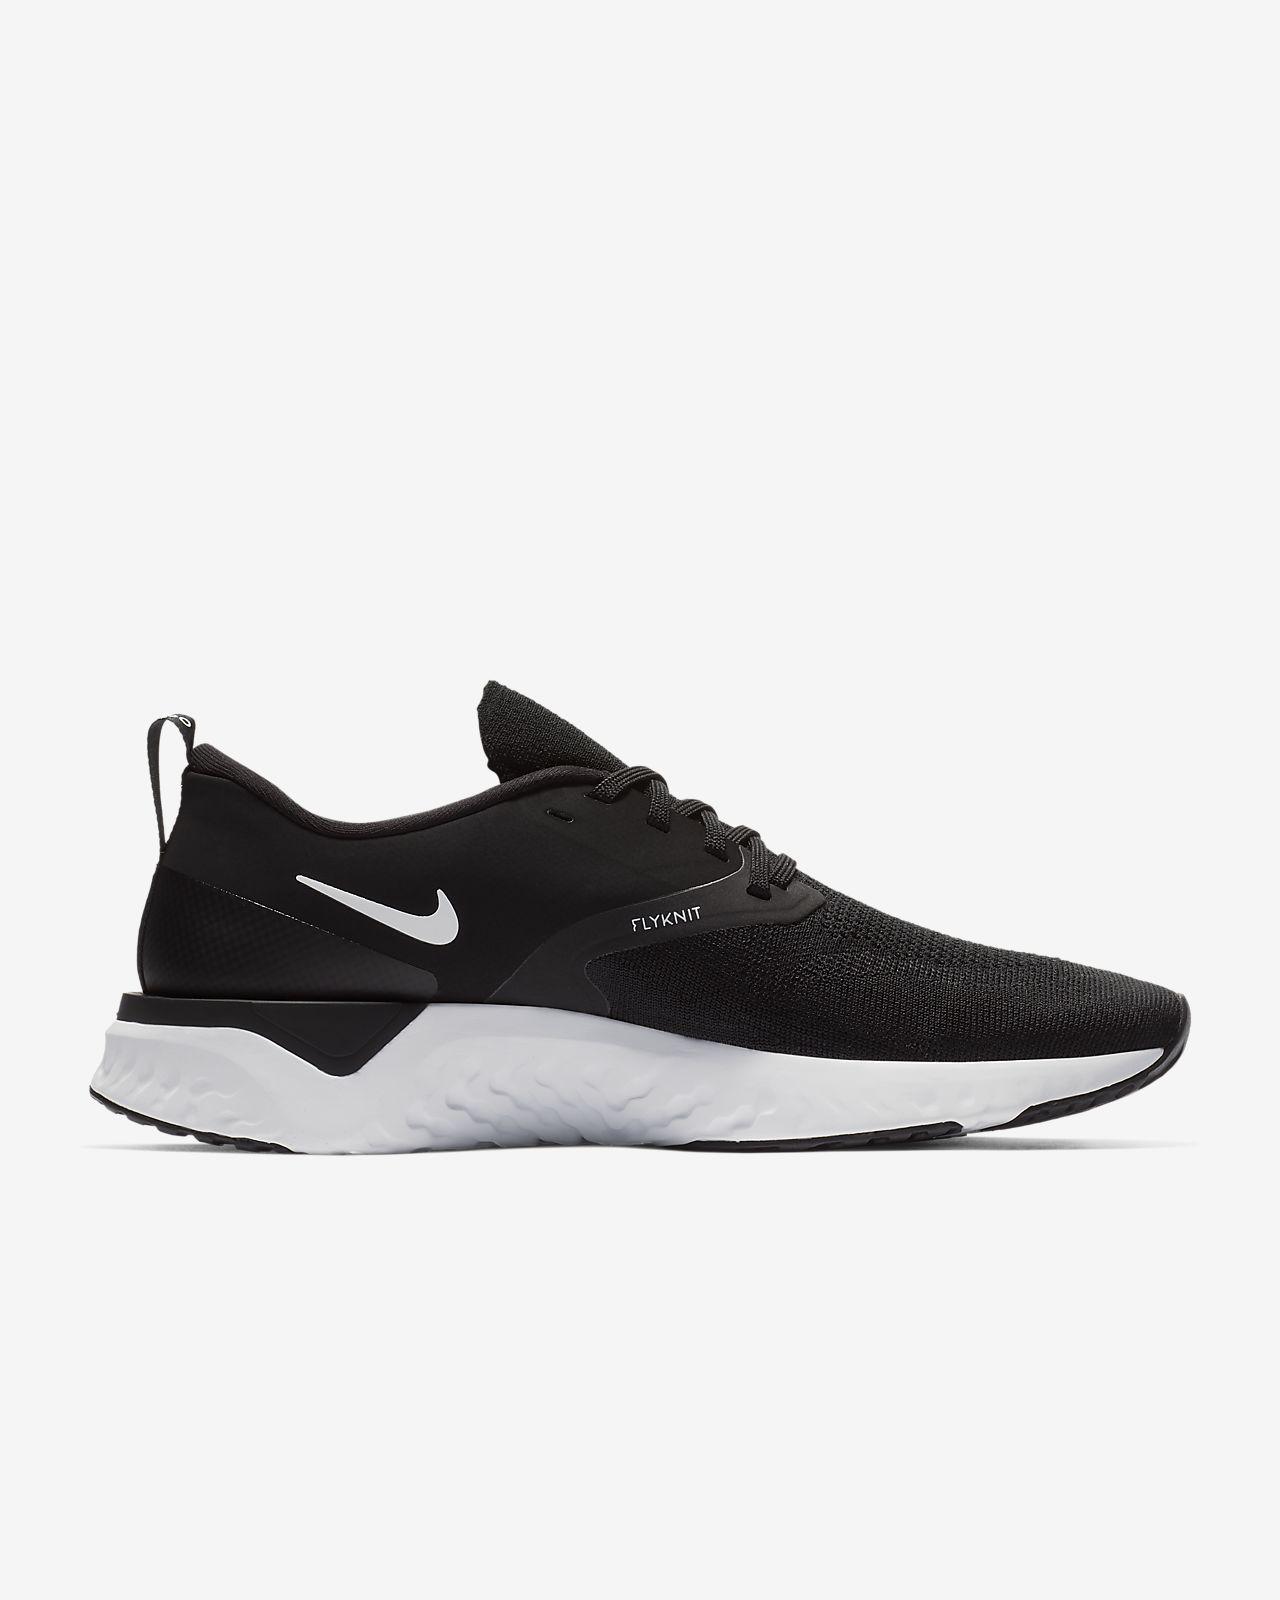 Nike Sportswear REACT PRESTO Menn svart Rund Joggesko